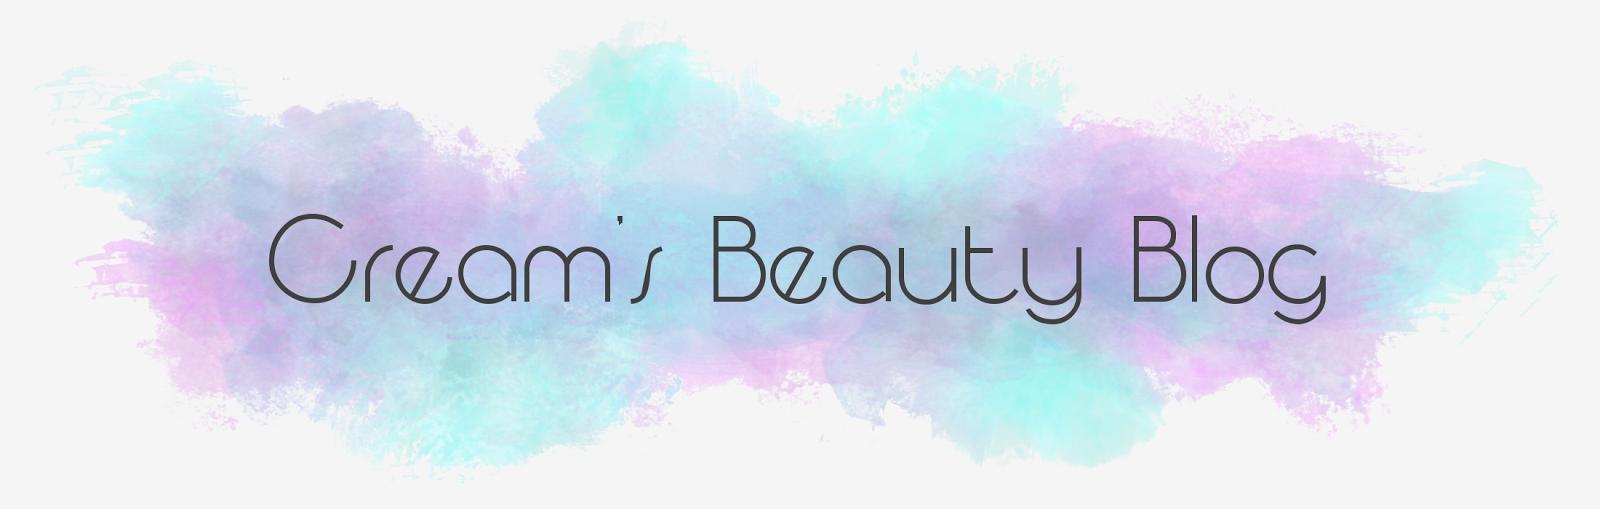 http://creamsbeautyblog.de/